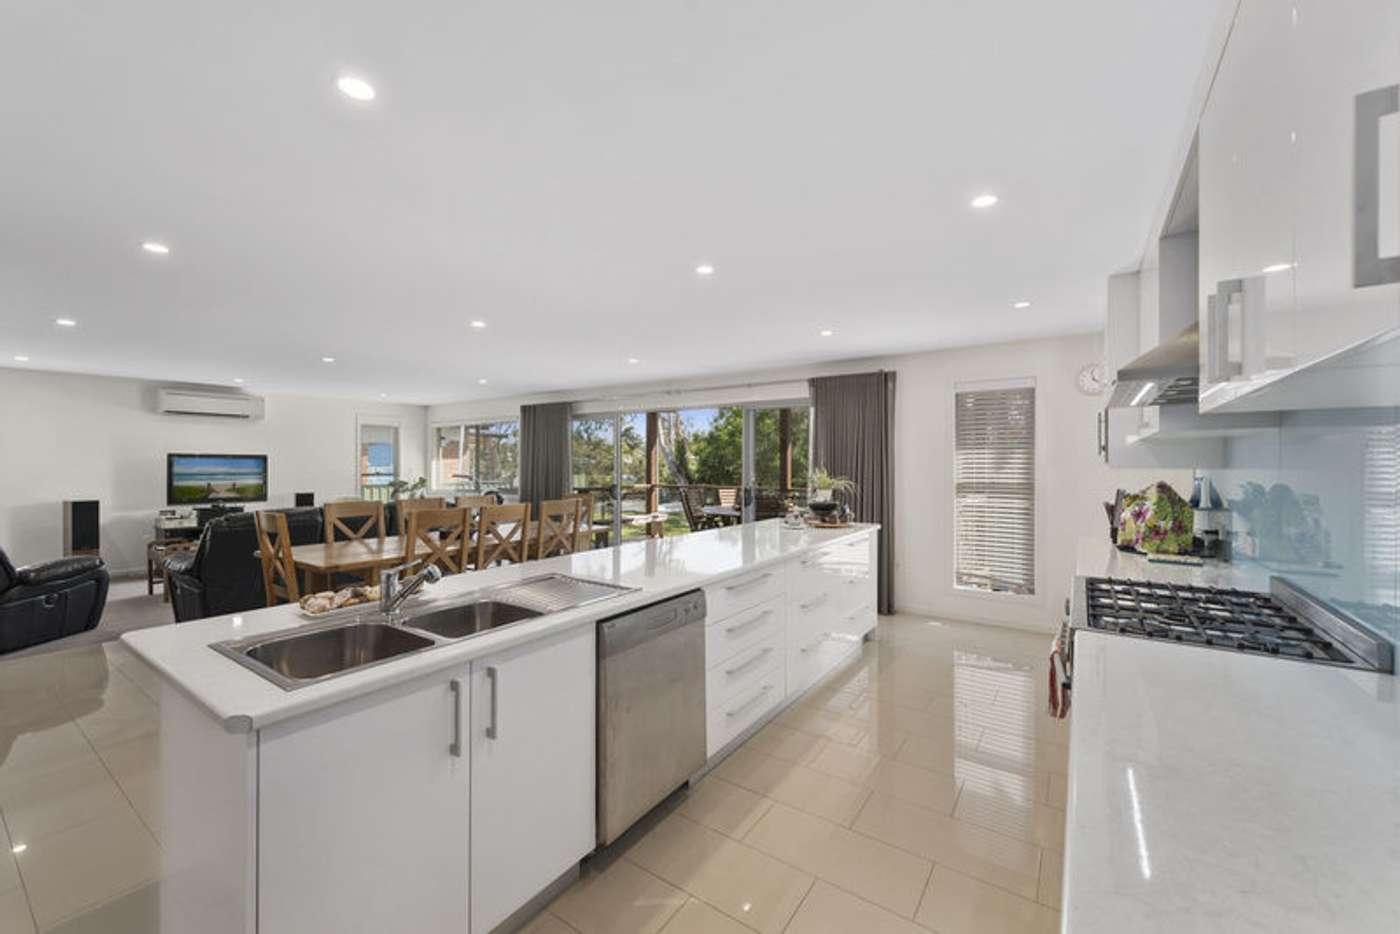 Sixth view of Homely house listing, 4419 Giinagay Way, Urunga NSW 2455